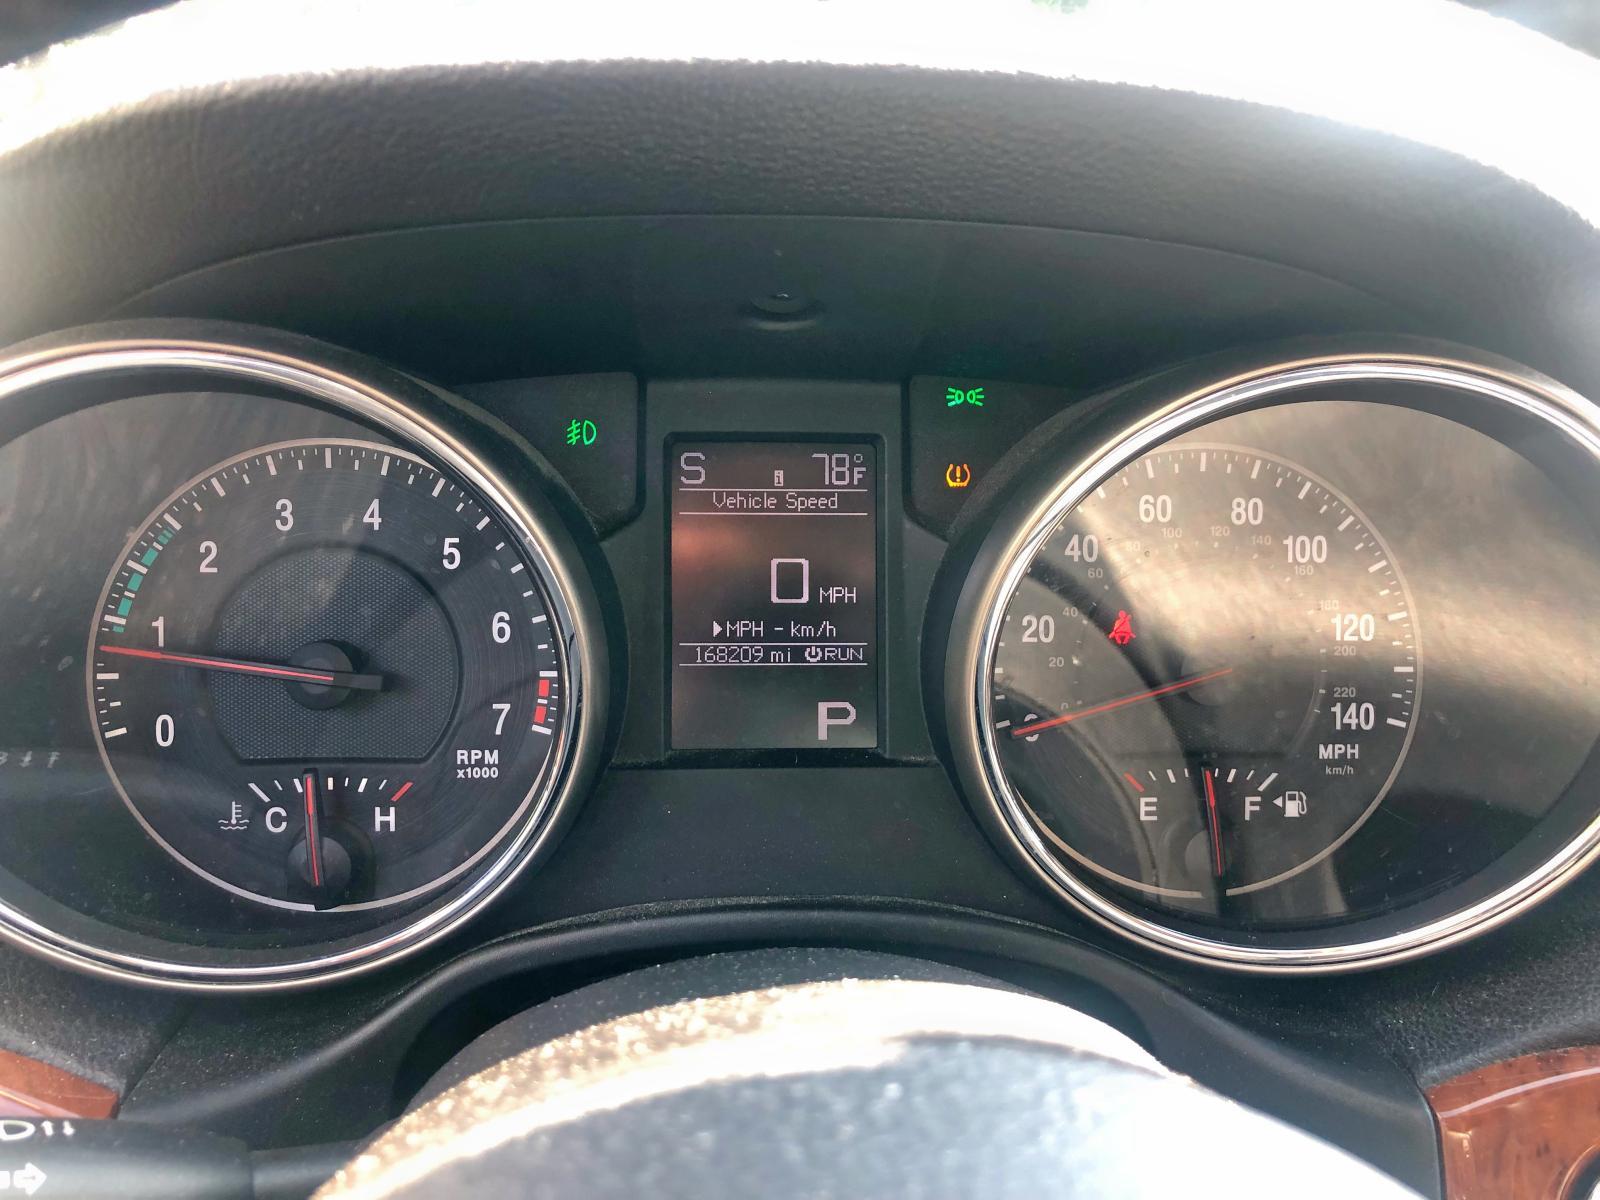 1J4RR5GG0BC656093 - 2011 Jeep Grand Cher 3.6L inside view